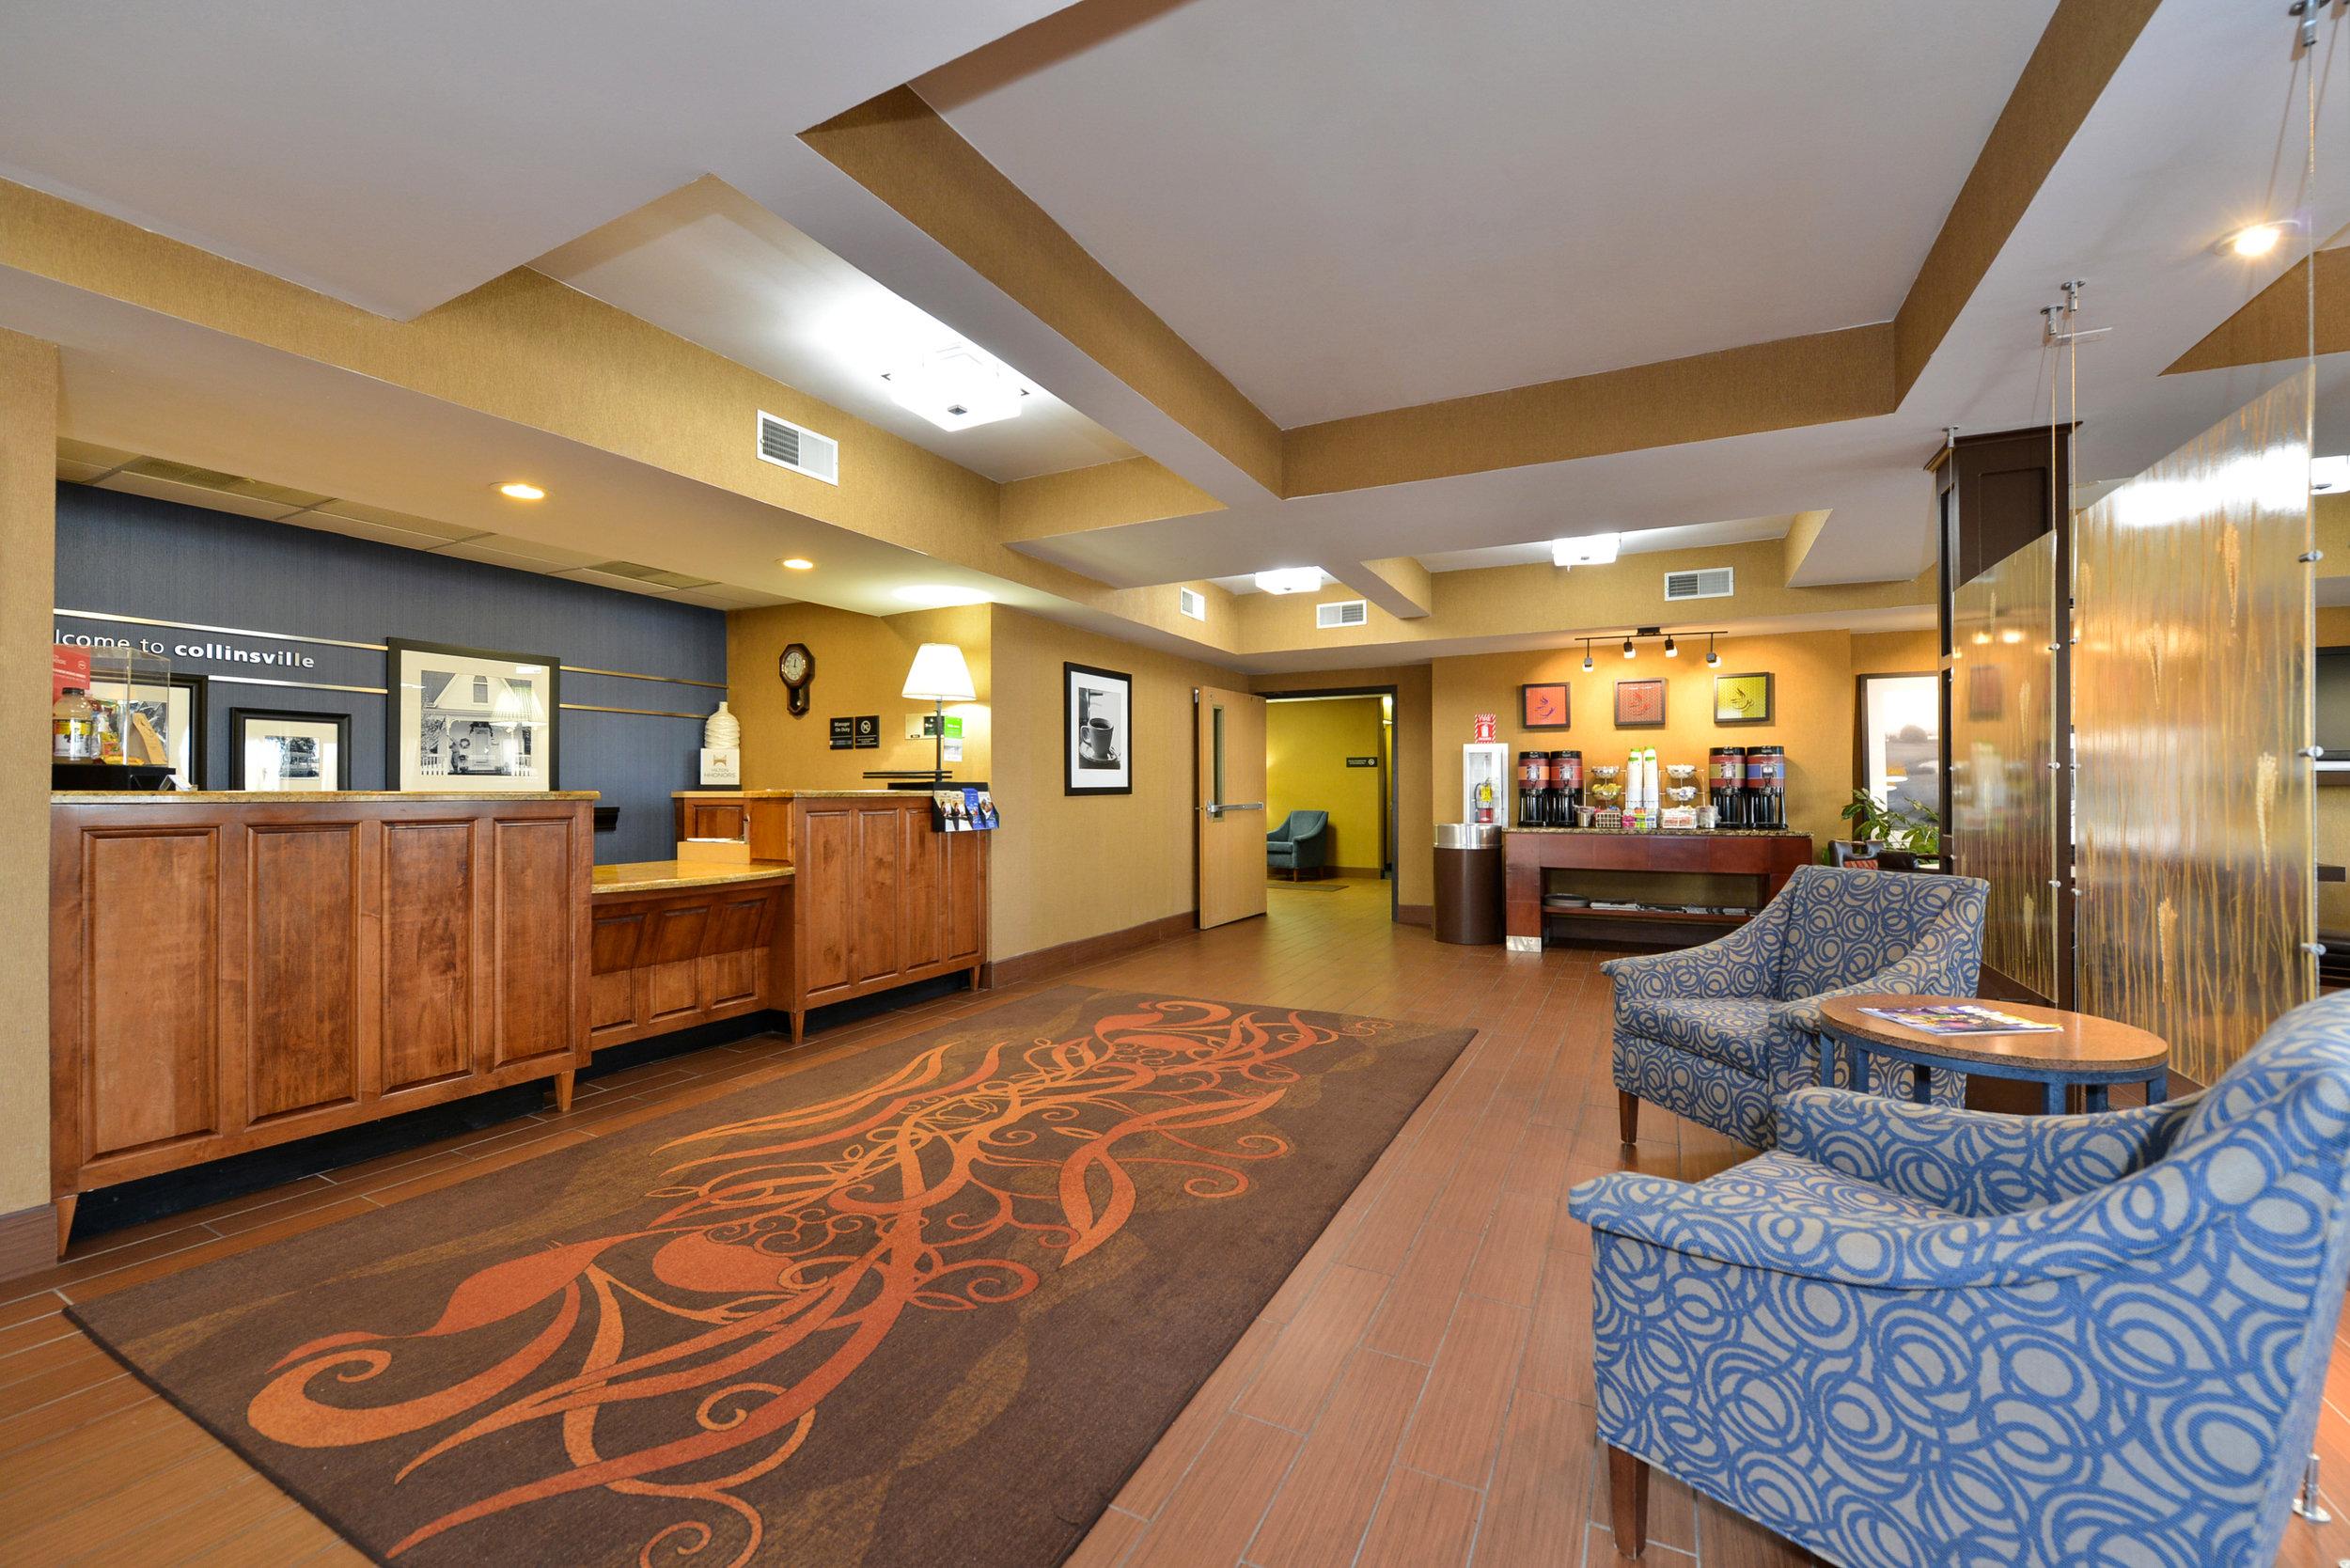 Hampton inn lobby.jpg